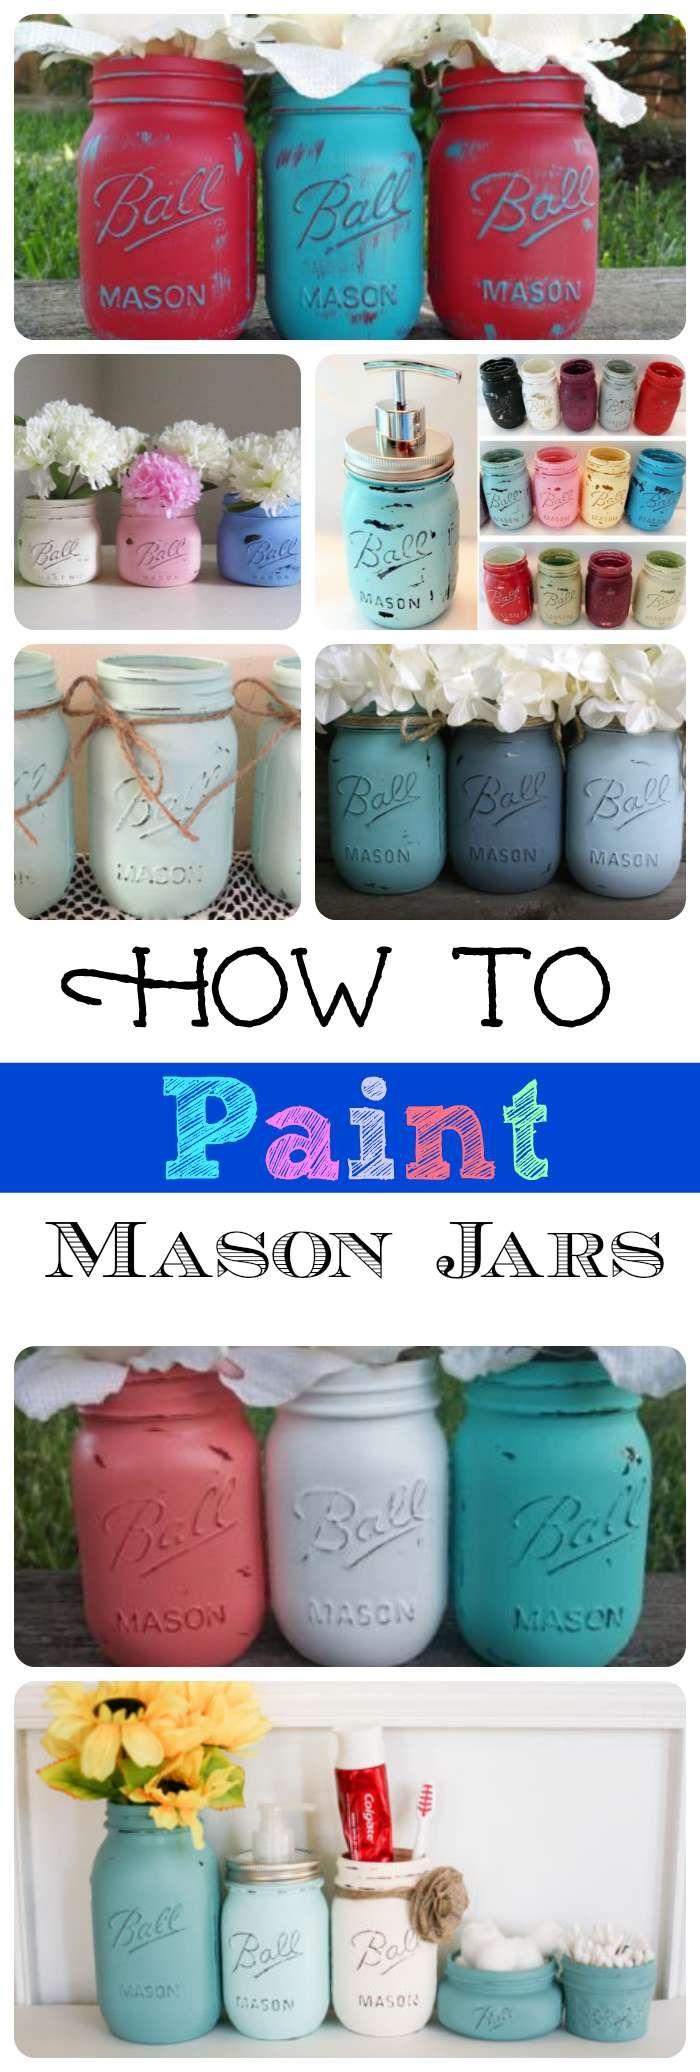 How-to-Paint-Glass-Bottles- | Mason jar projects, Mason ...